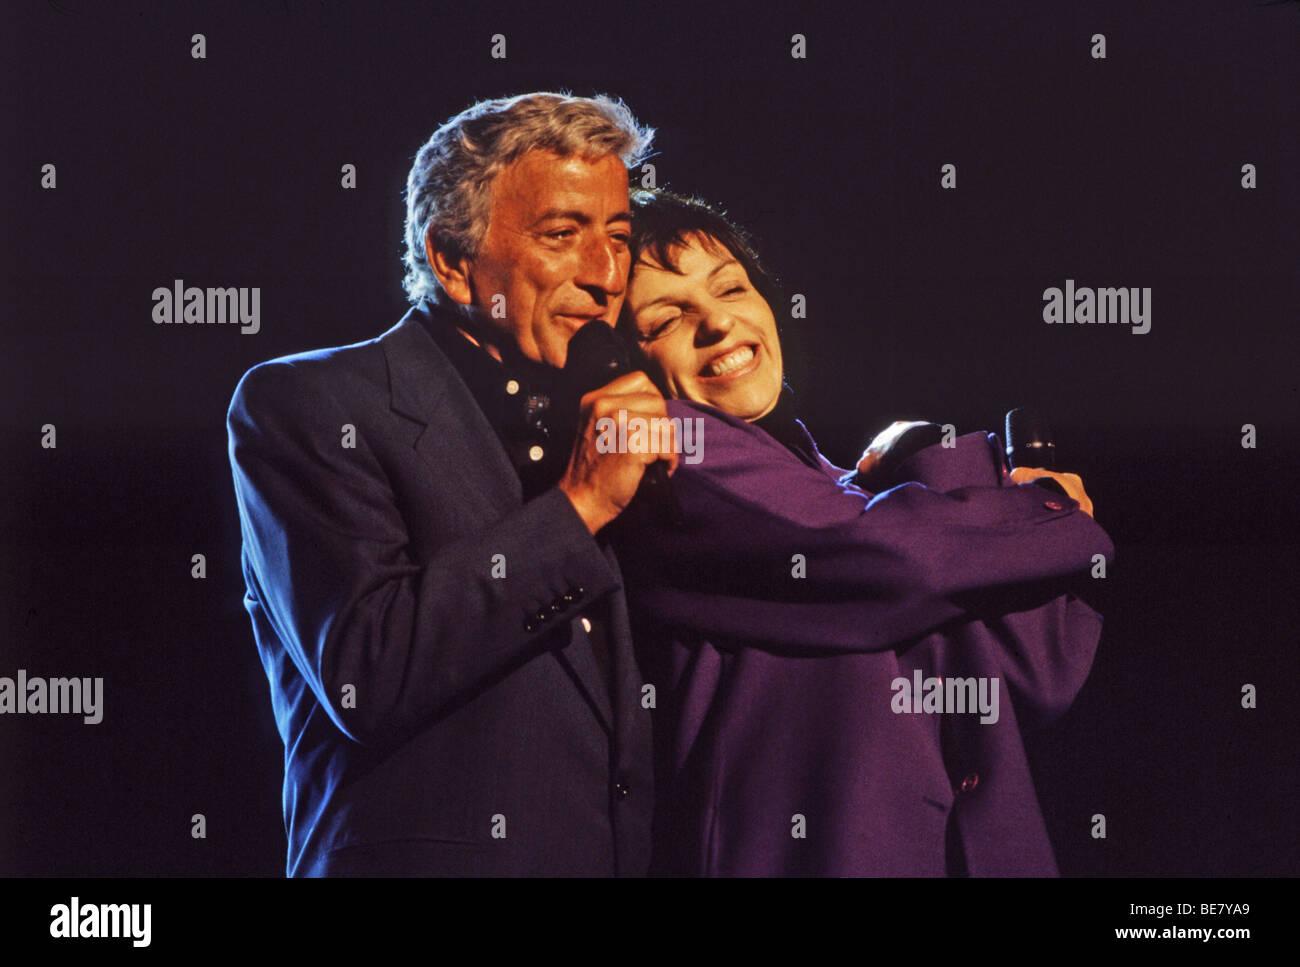 TONY BENNETT duets with Liza Miinnelli Stock Photo: 25990673